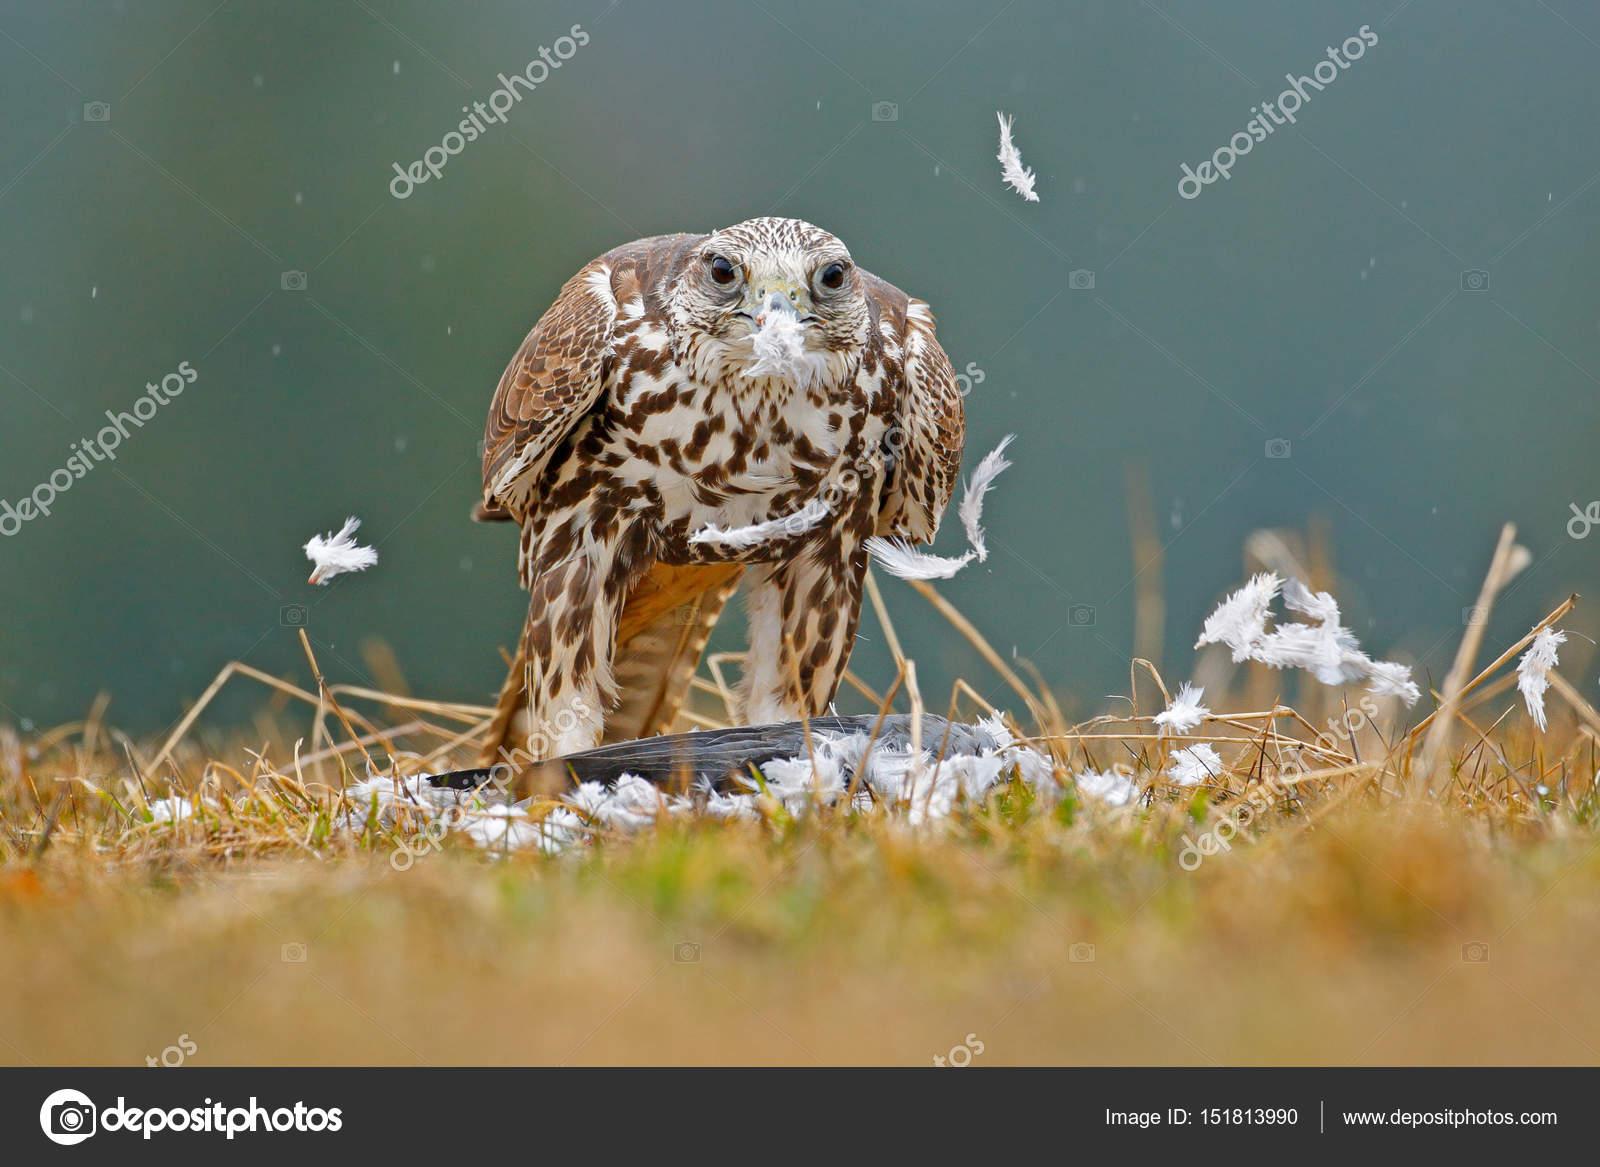 Lanner Falcon Mit Haken Vogel Stockfoto Ondrejprosicky 151813990